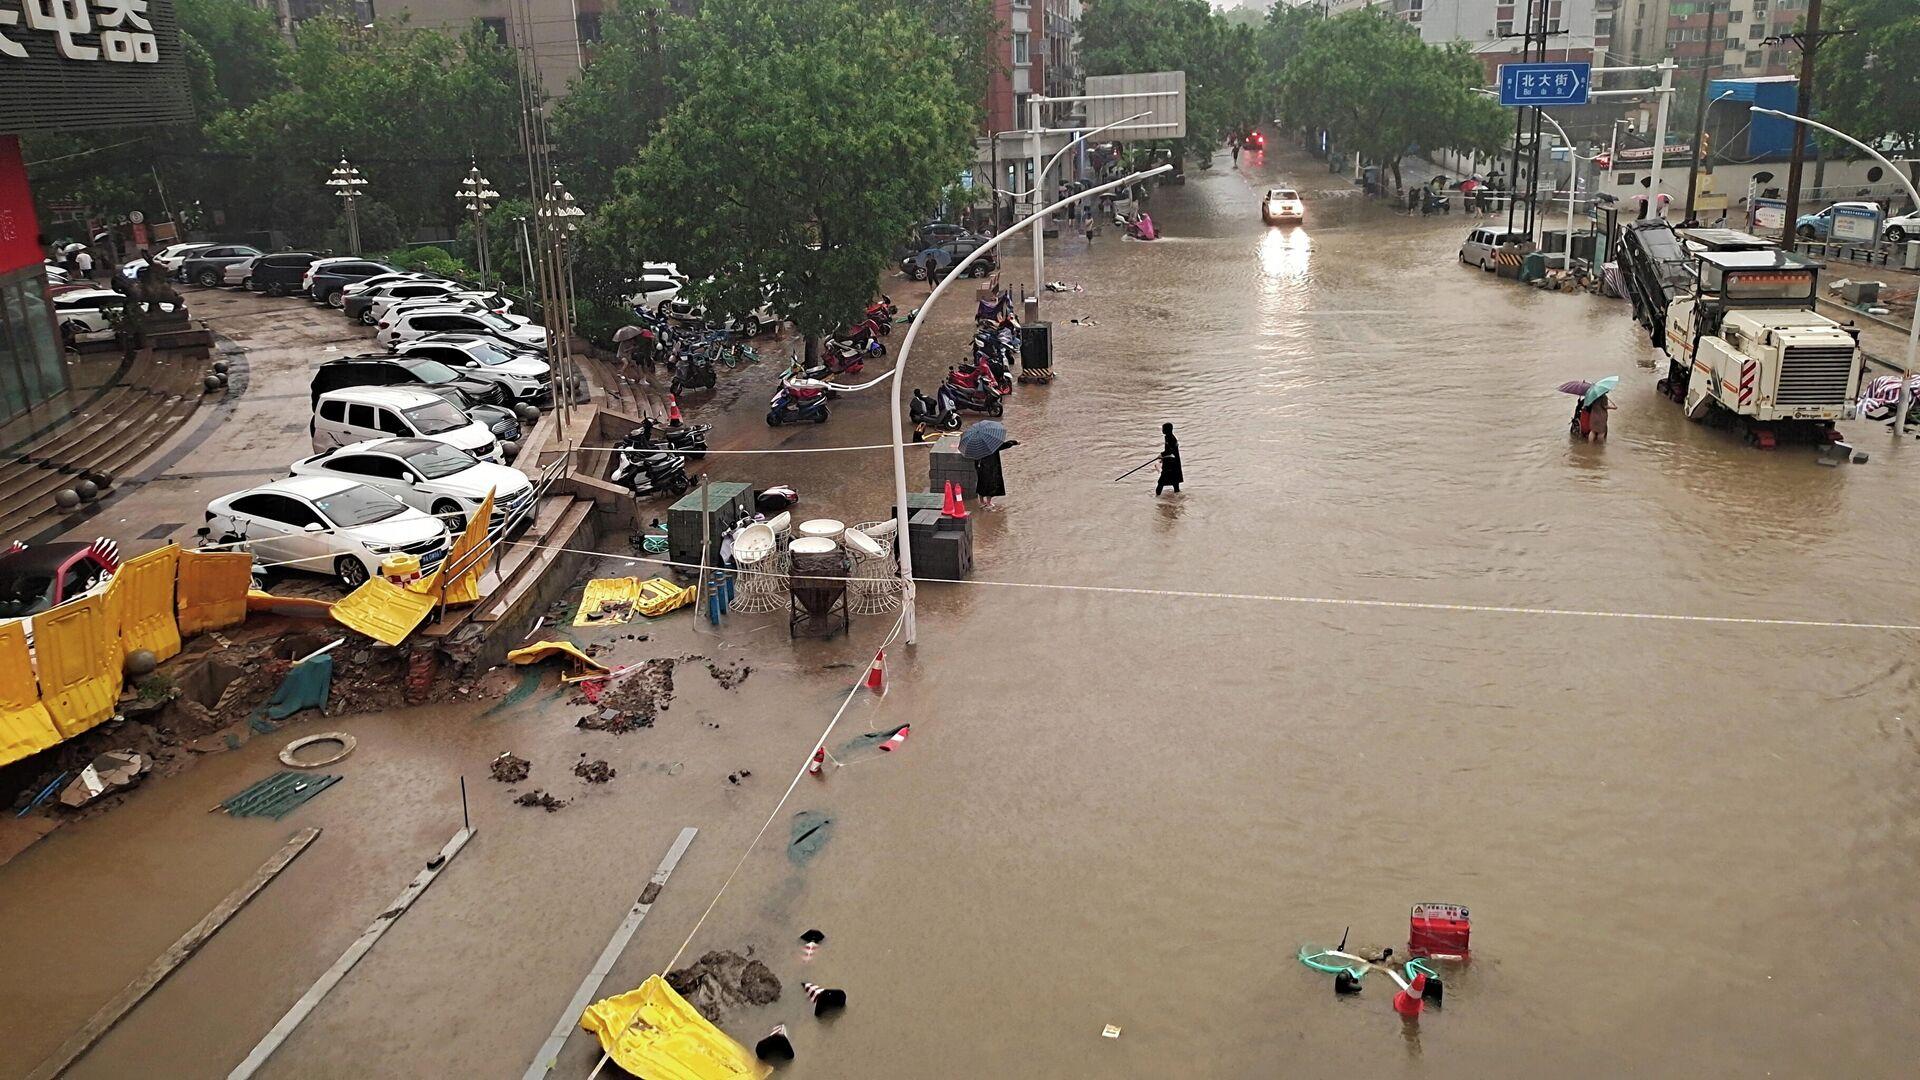 Наводнение в Чжэнчжоу, Китай - РИА Новости, 1920, 26.07.2021